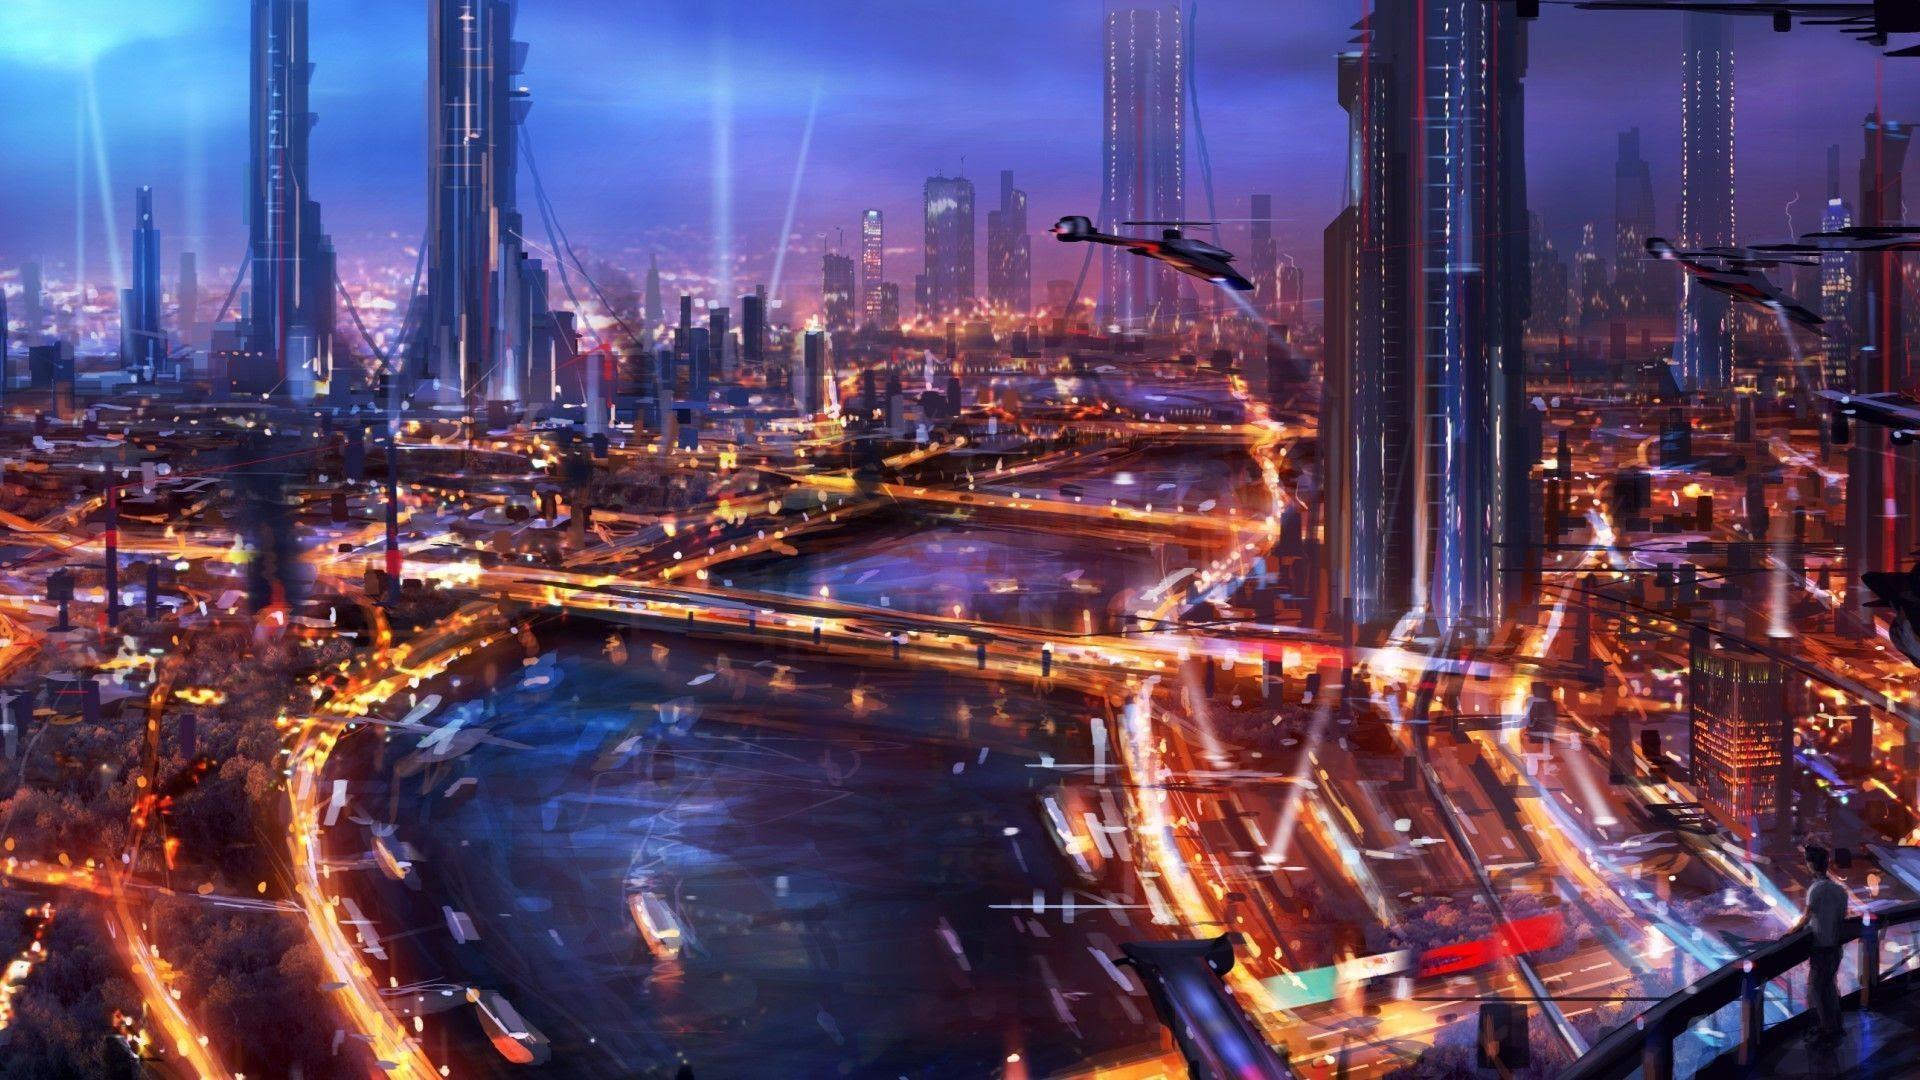 Hd Cyberpunk Cyberpunk City Wallpaper 2560x1440